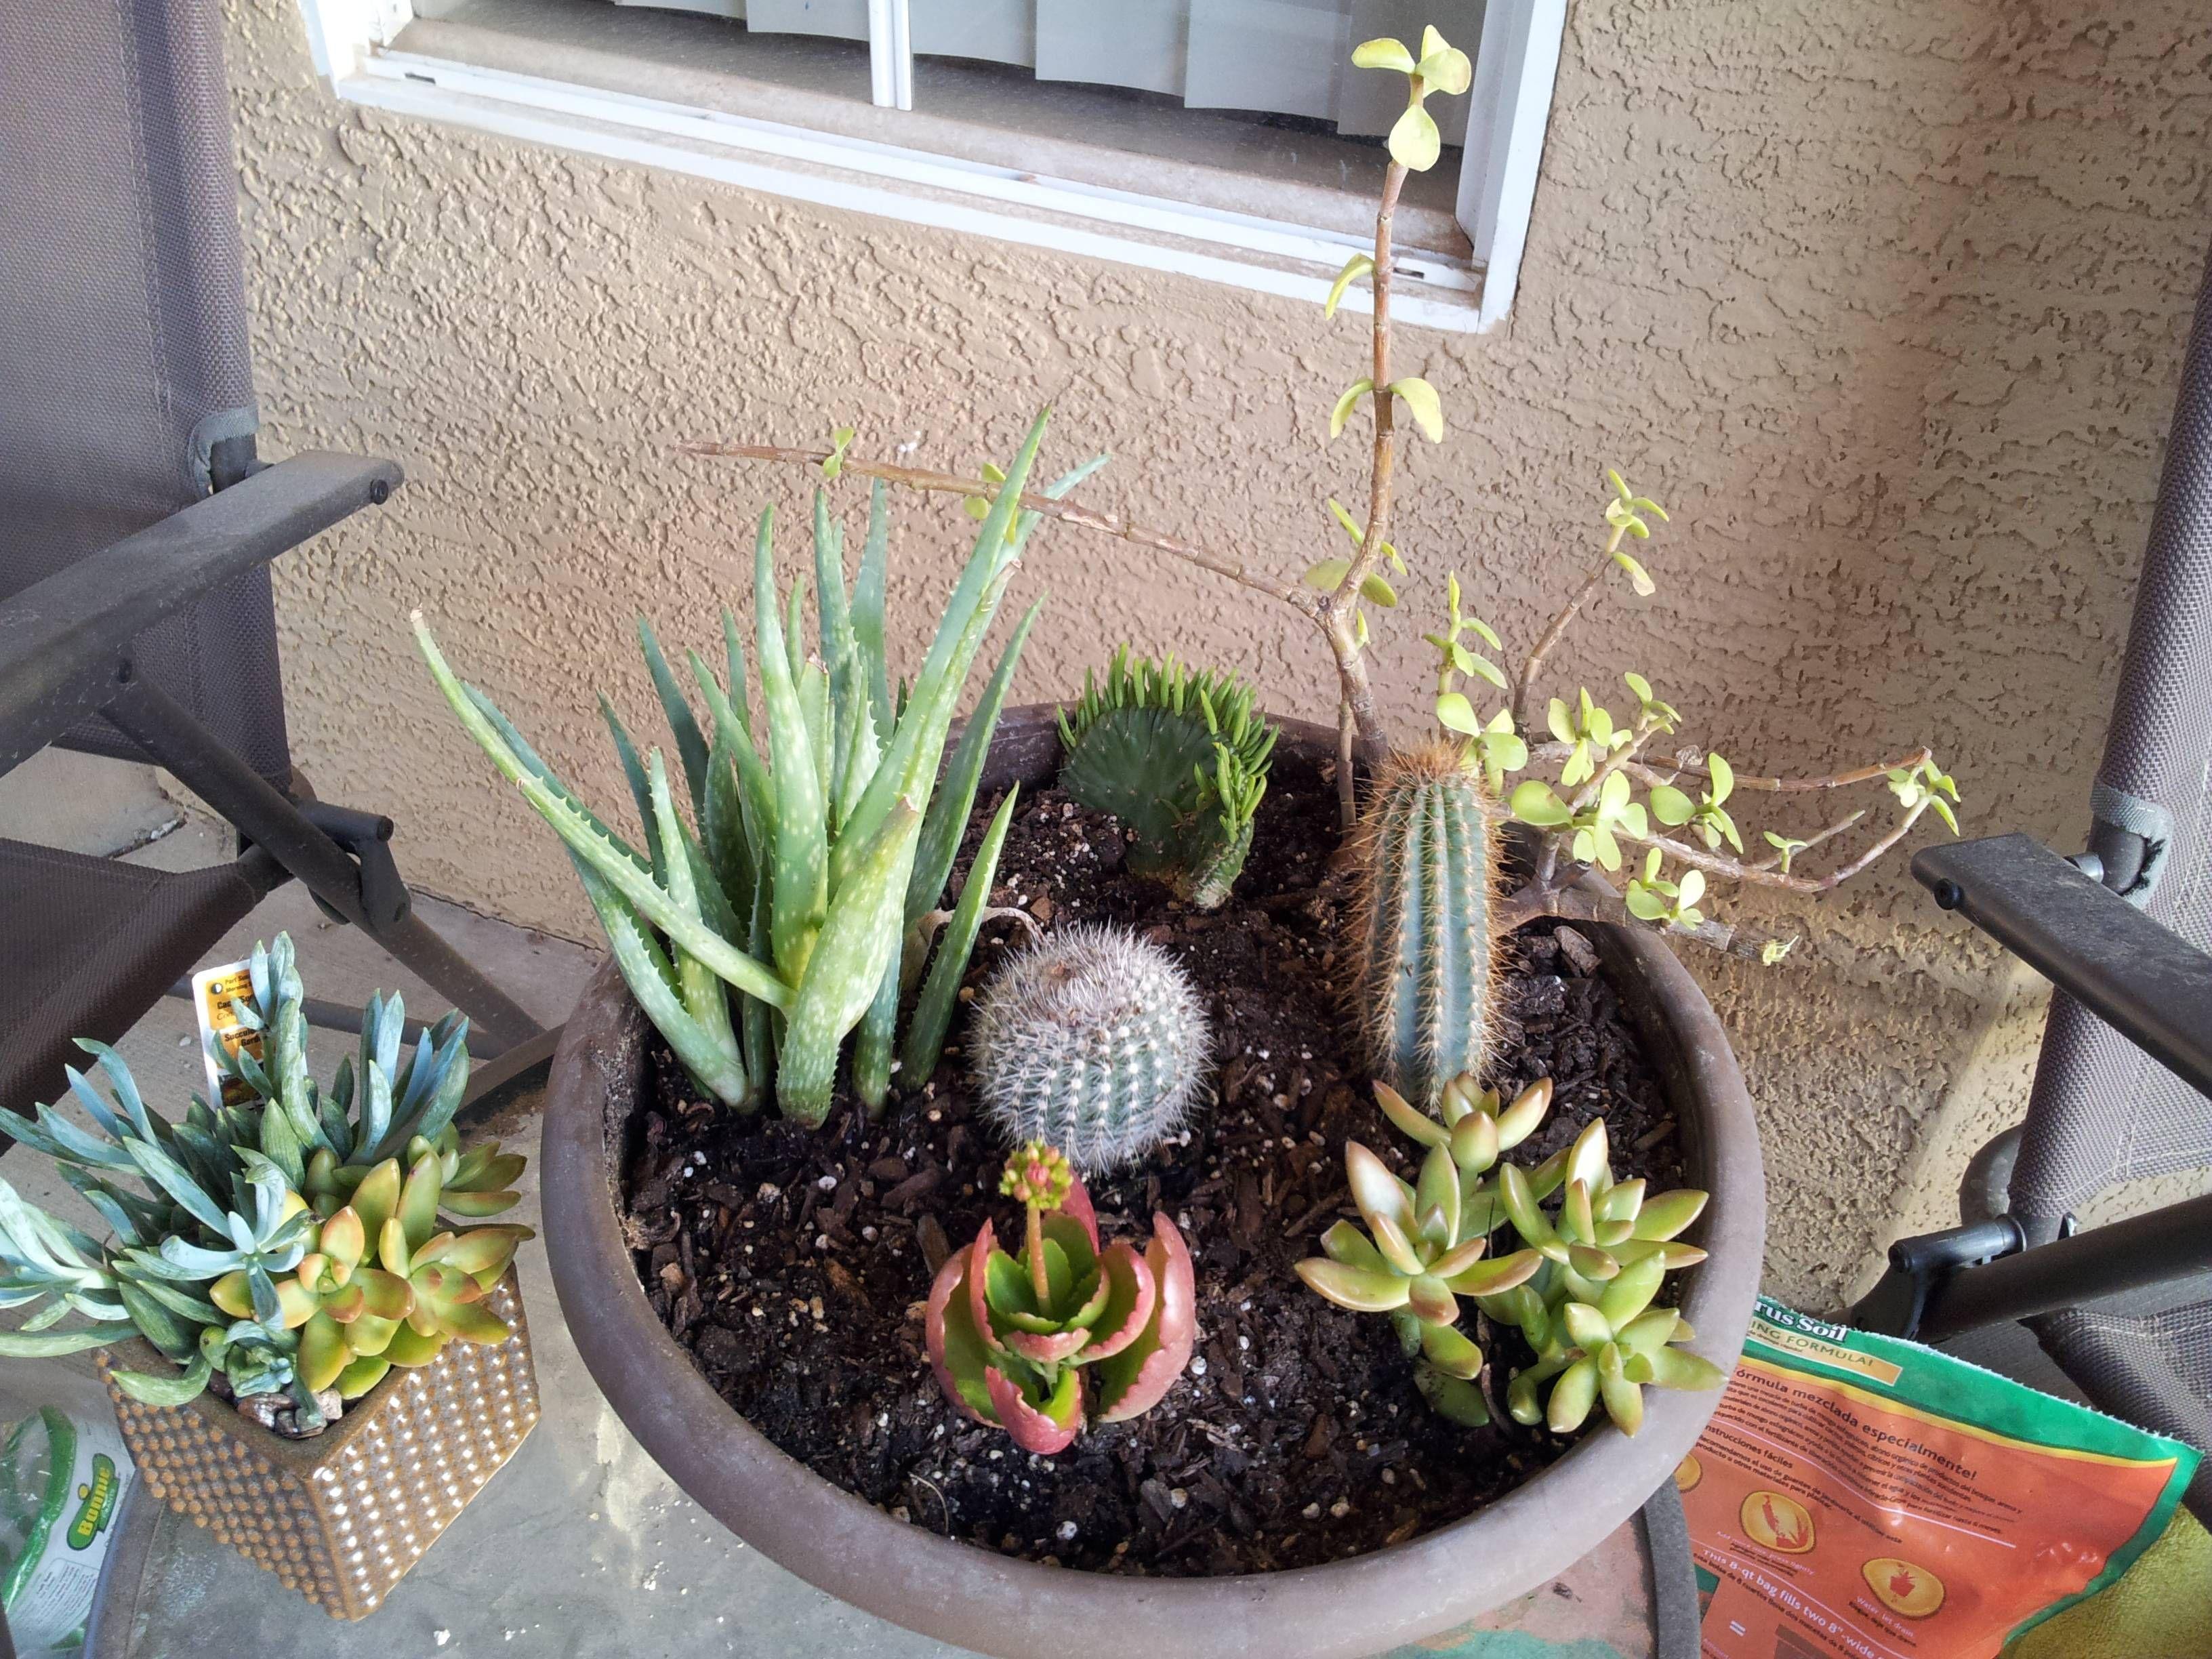 http://www.reddit.com/r/gardening/comments/1t4lzi/homemade_mini_succulent_garden/